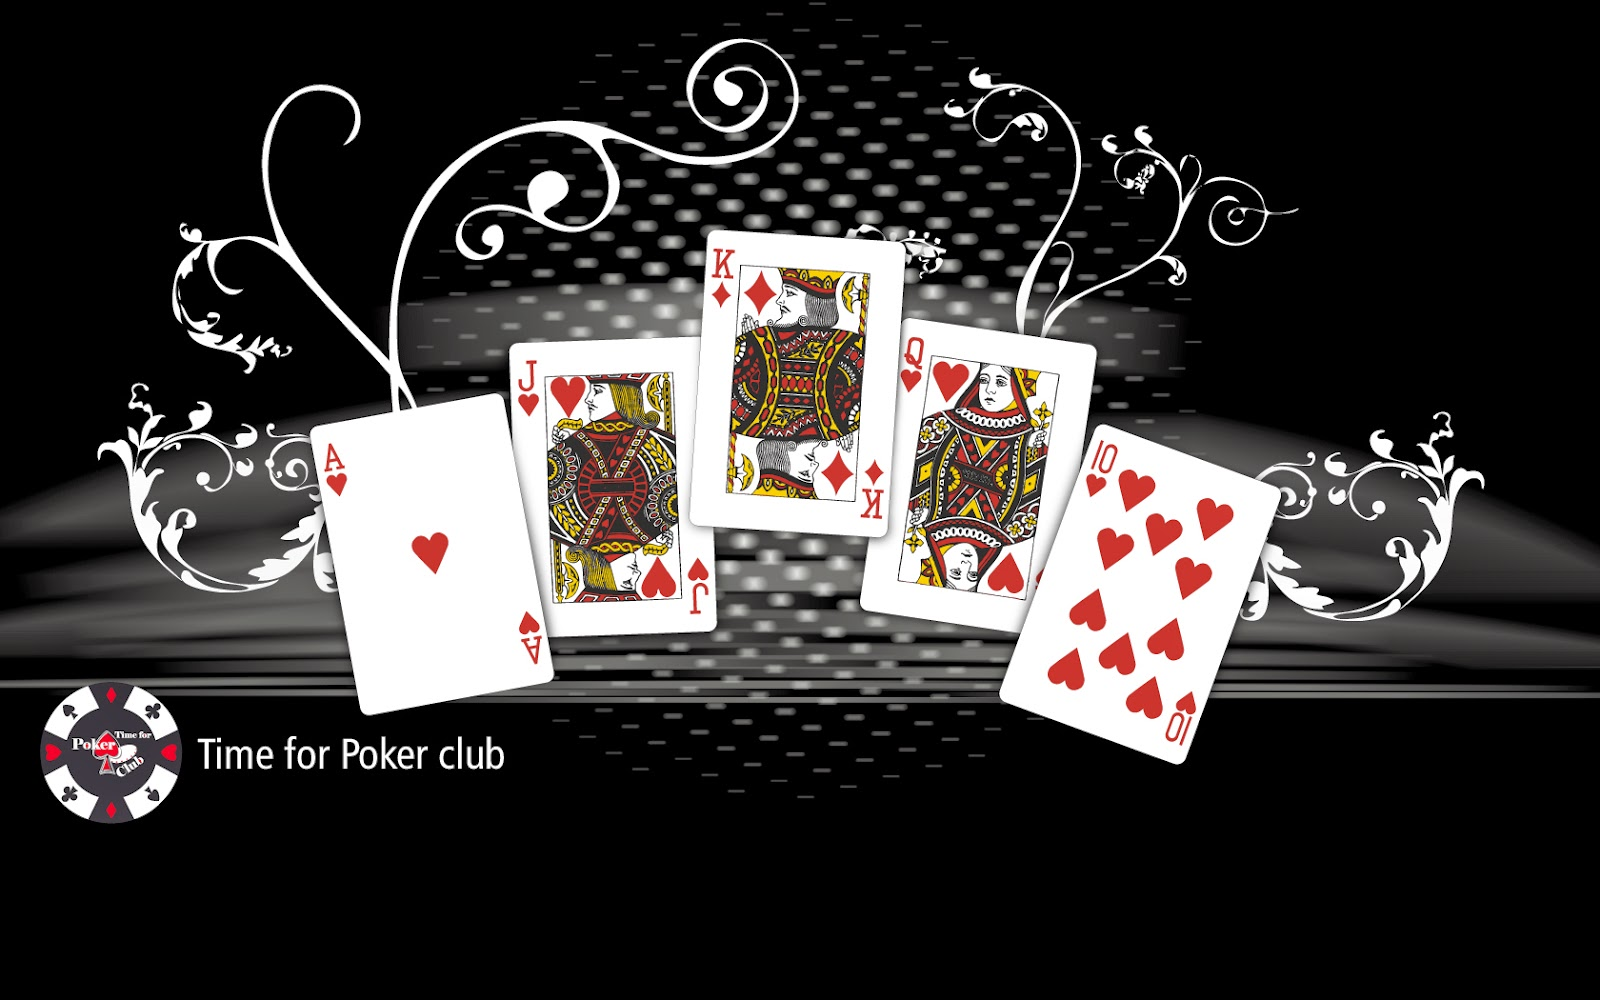 Sayapoker.com: Agen Judi Poker Dan Domino Online